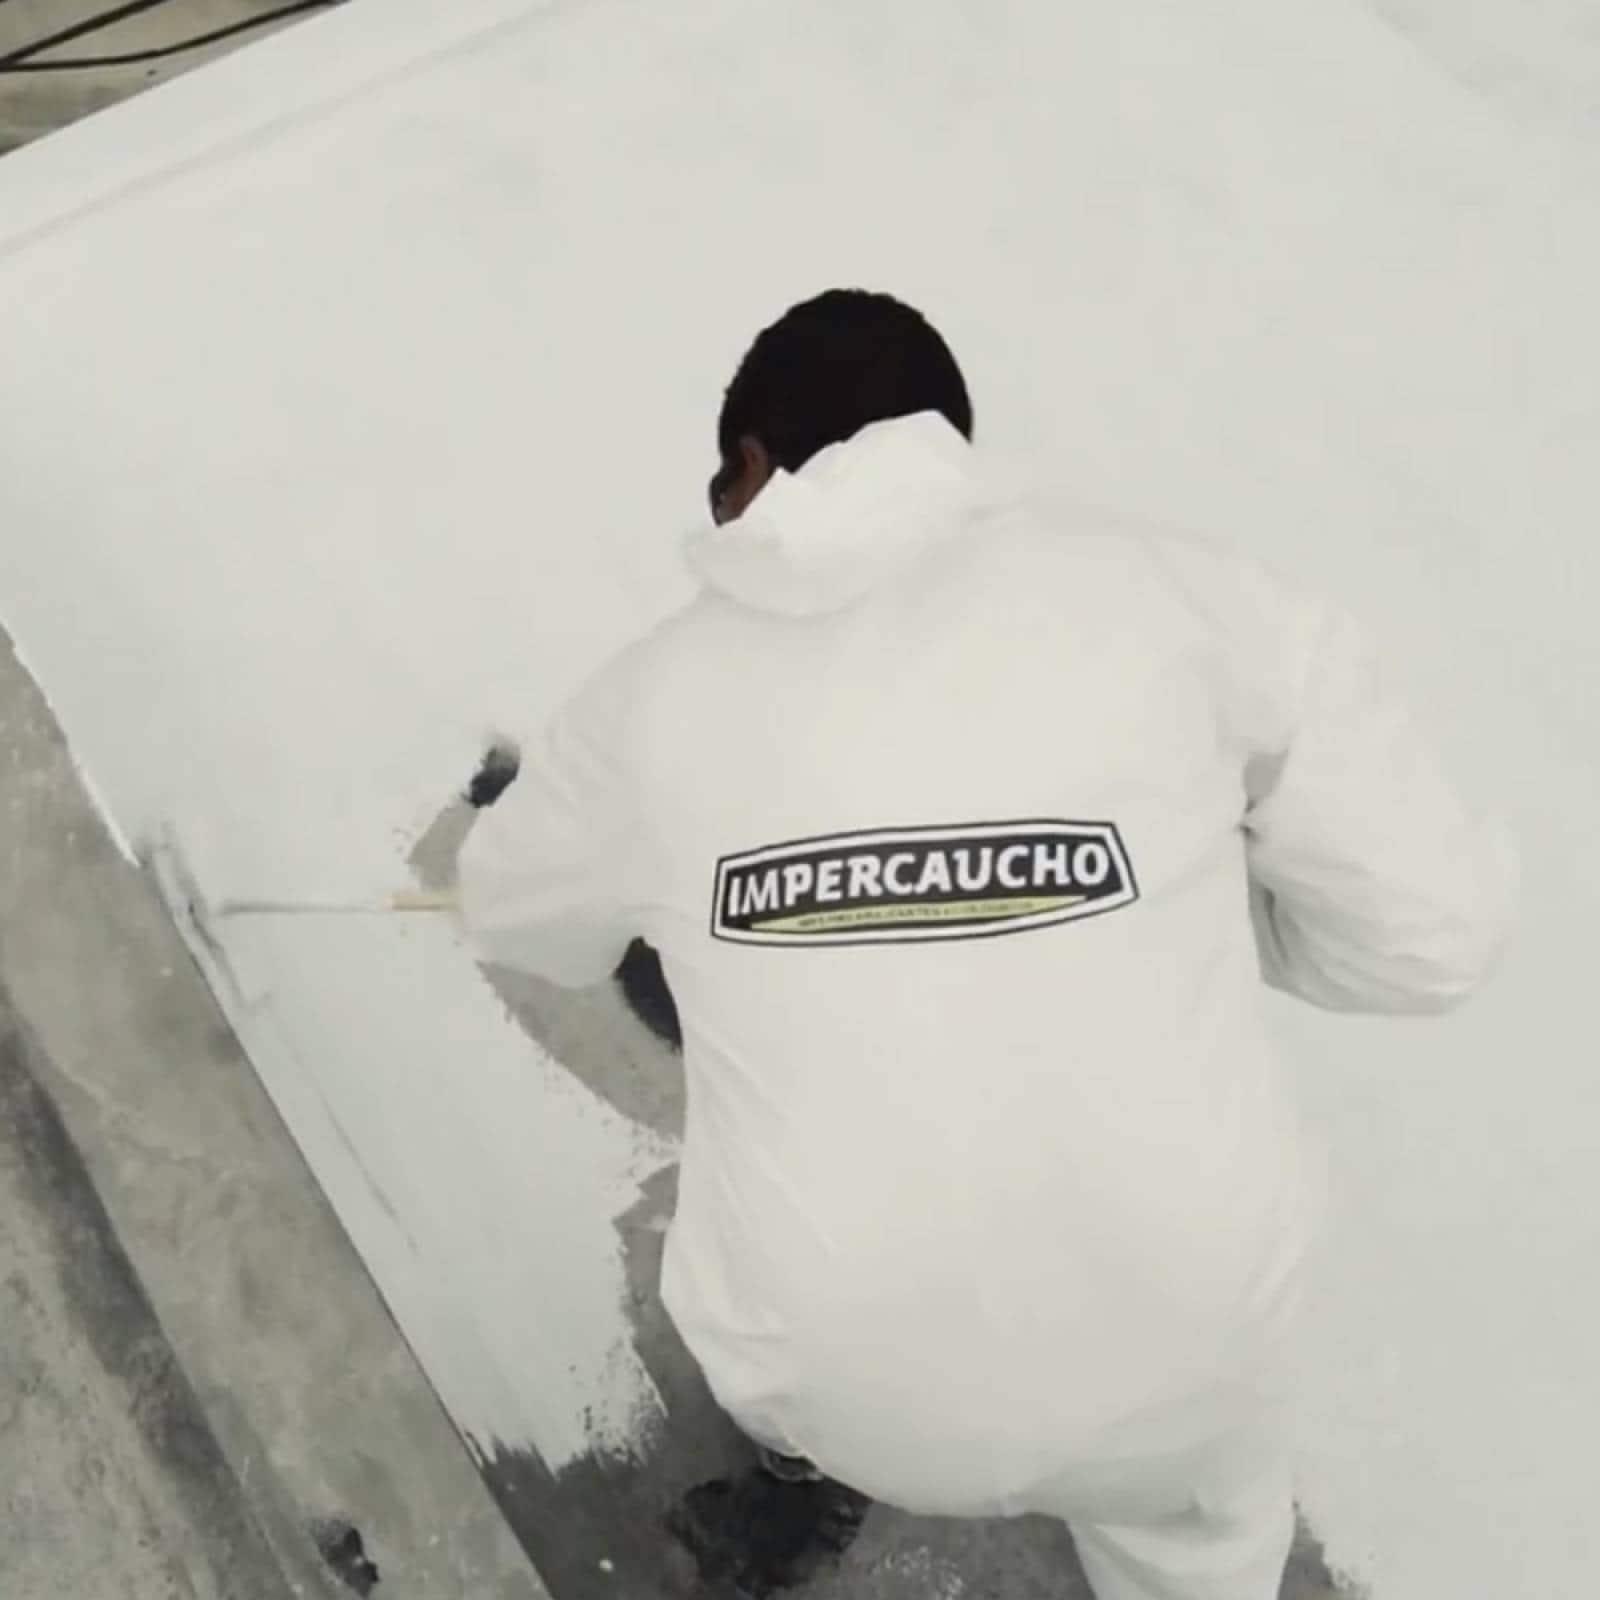 Impercaucho Impermeabilizante 12 Años Terracota 19 Lts